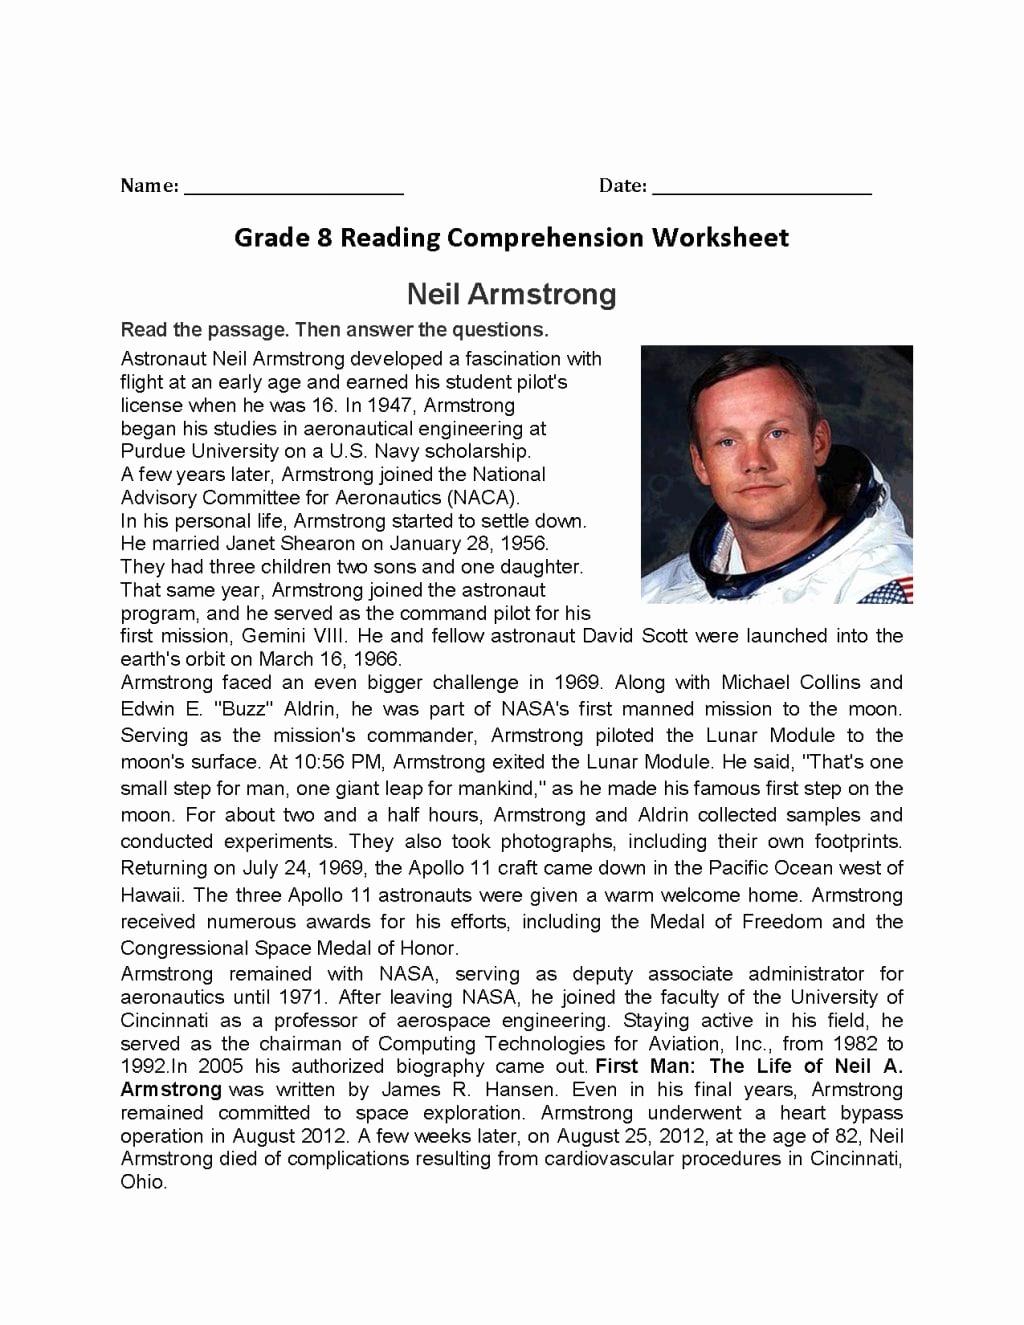 8th Grade Reading Worksheets New 8th Grade Reading Prehension Worksheets — Db Excel